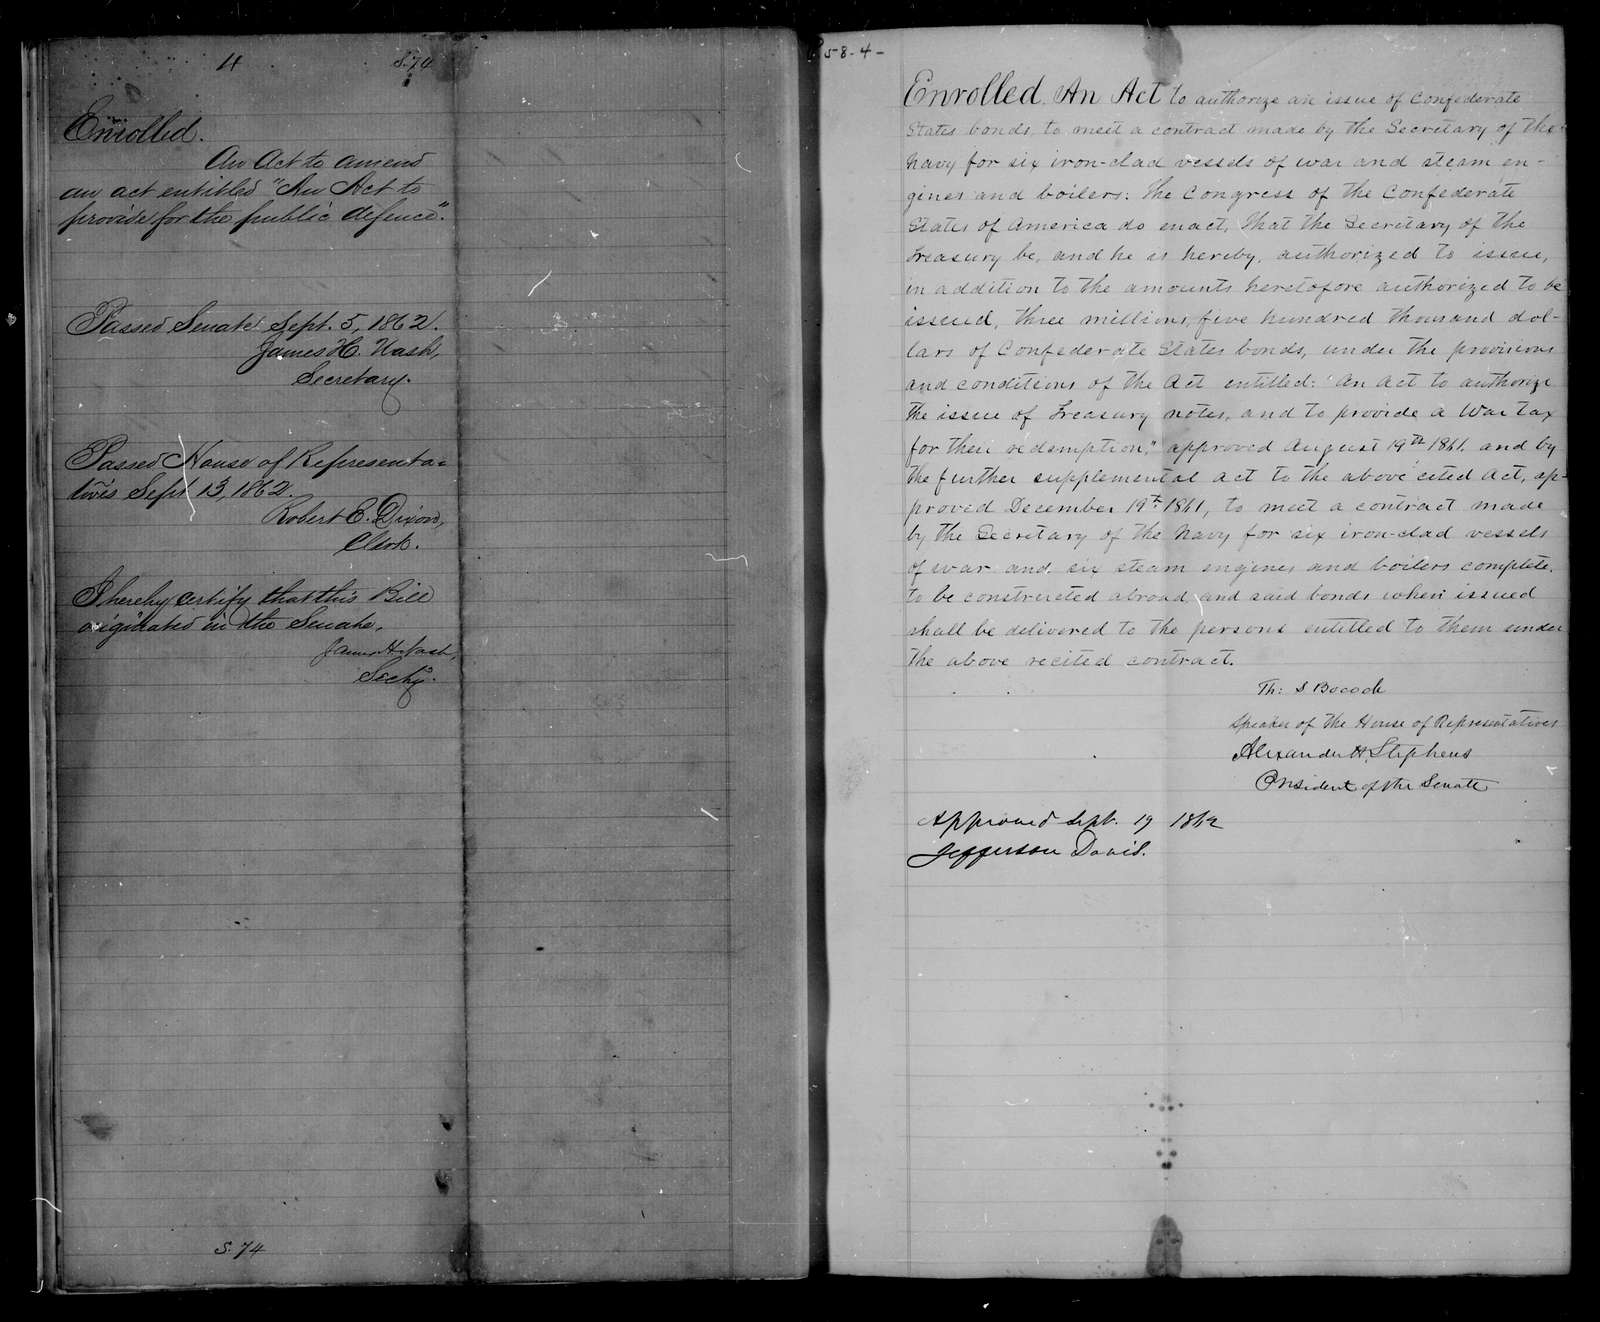 Confederate States of America records: Microfilm Reel 36